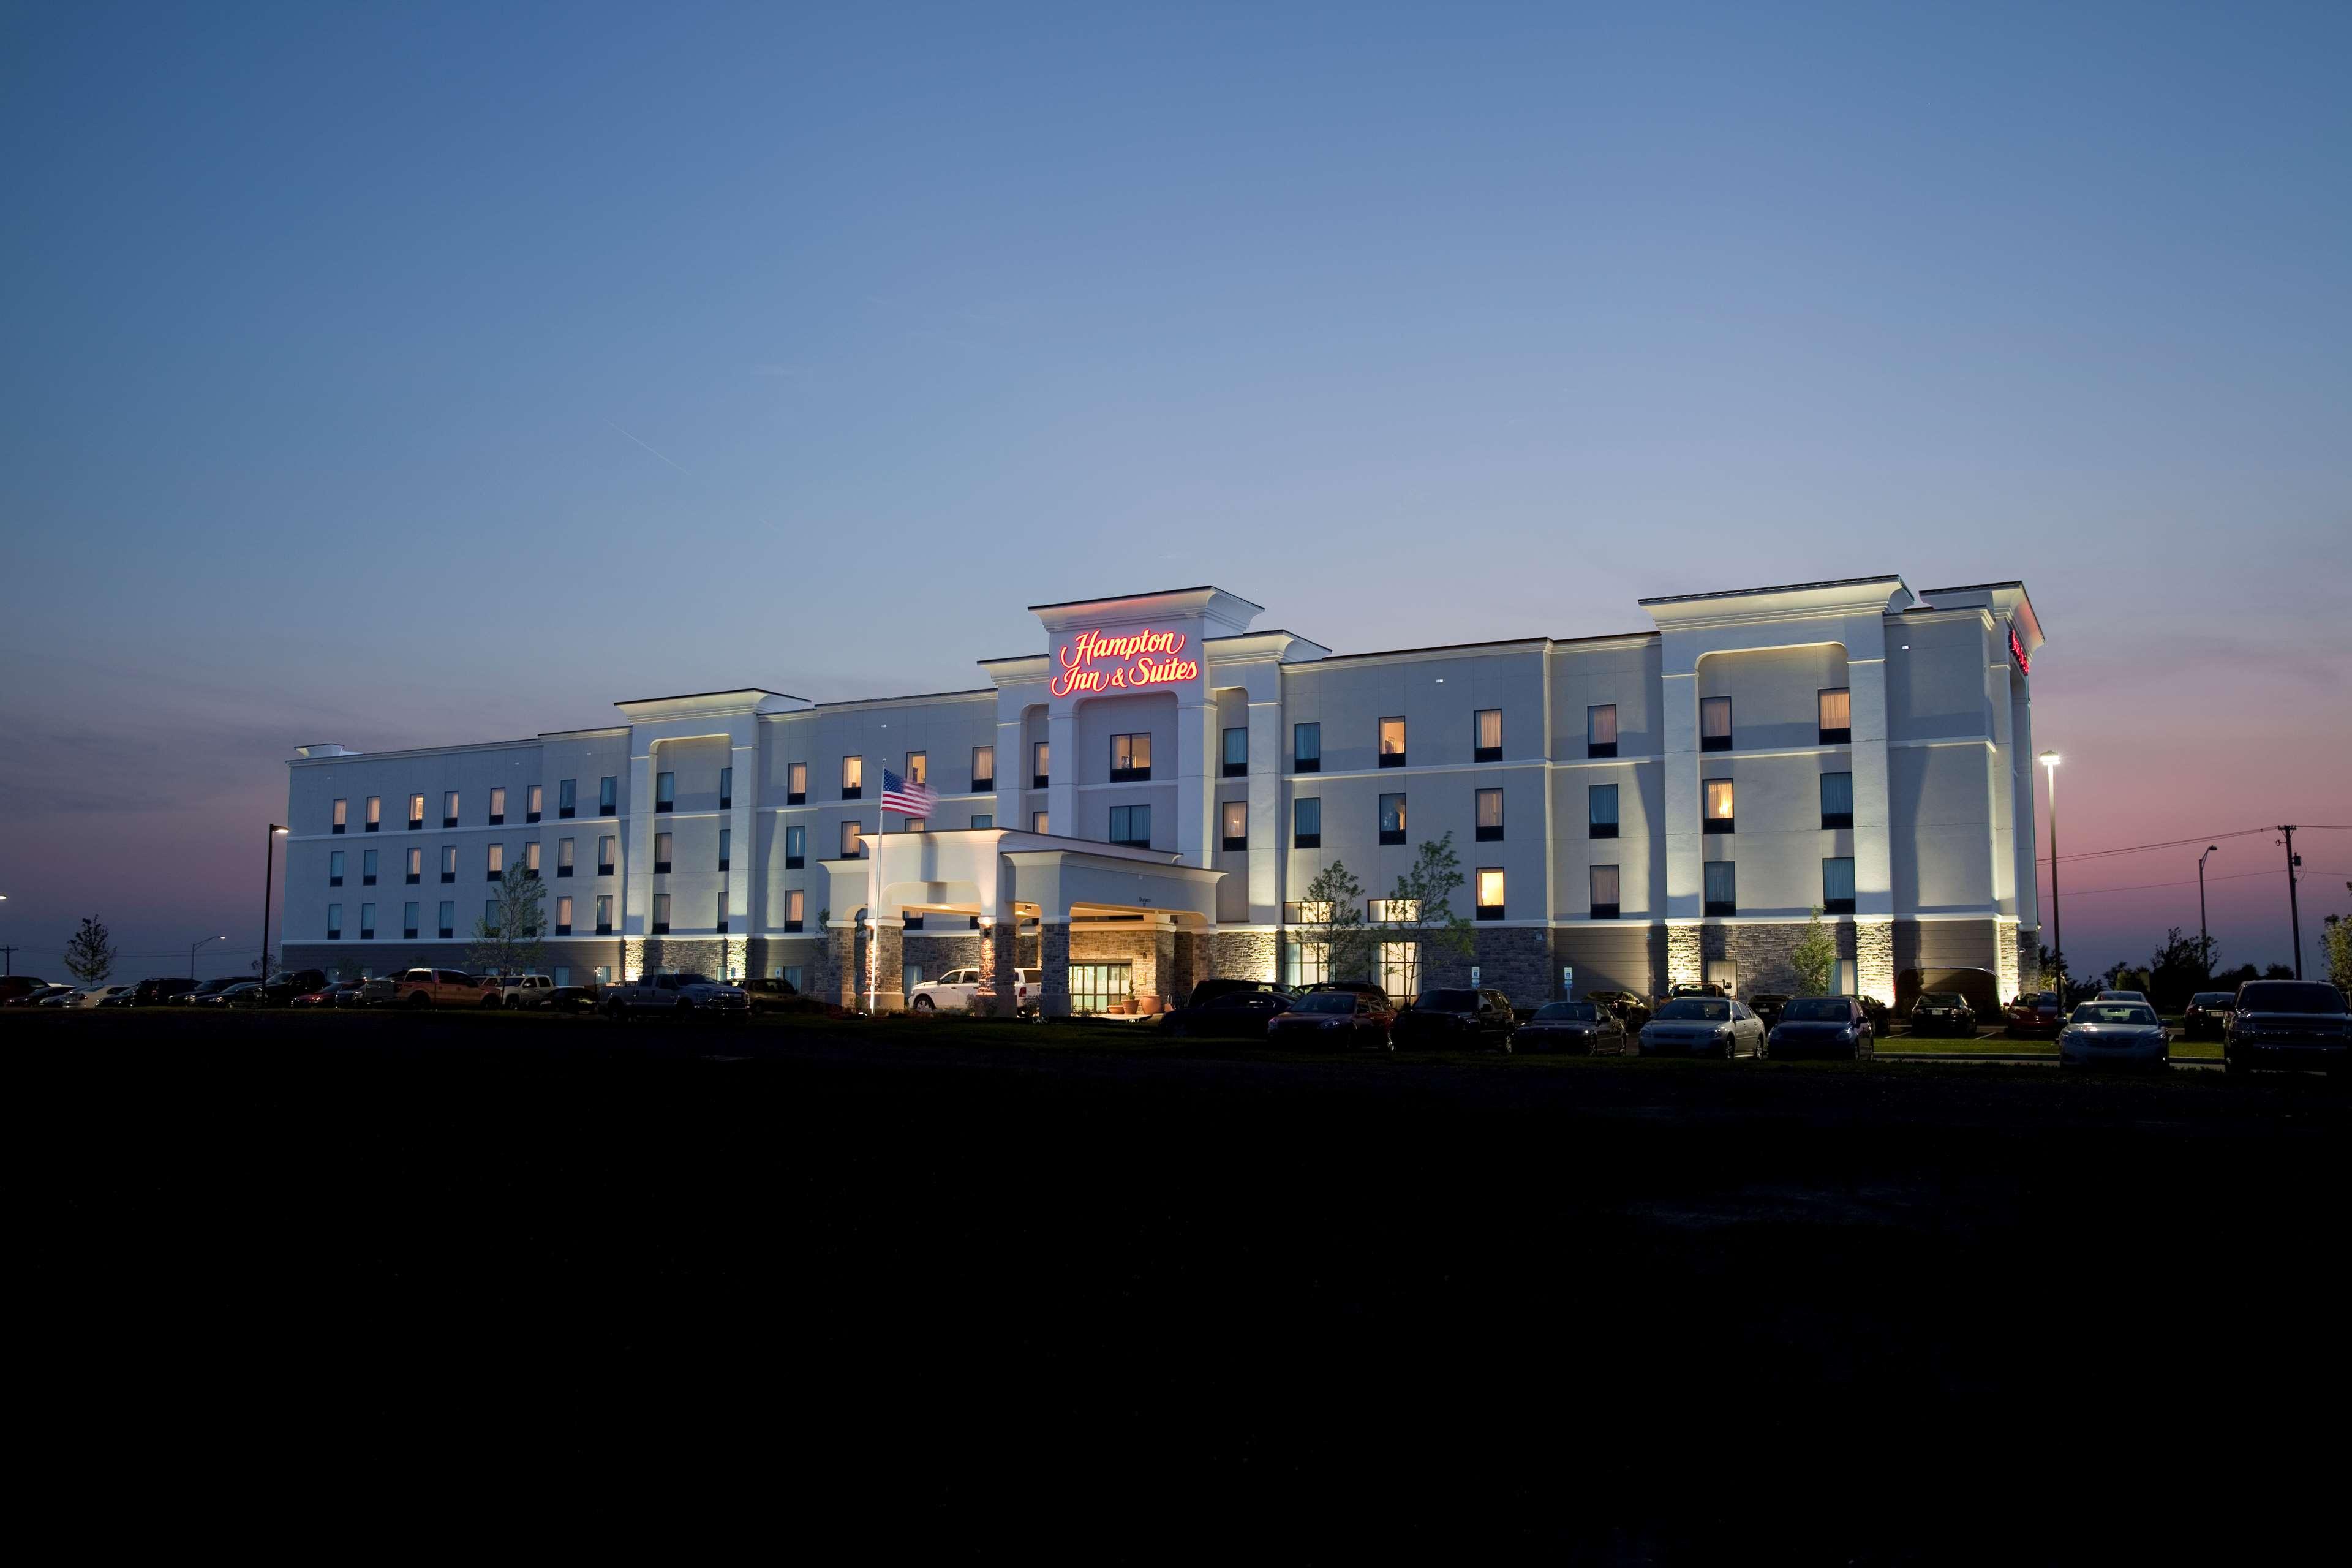 Hampton Inn & Suites Wheeling-The Highlands image 0